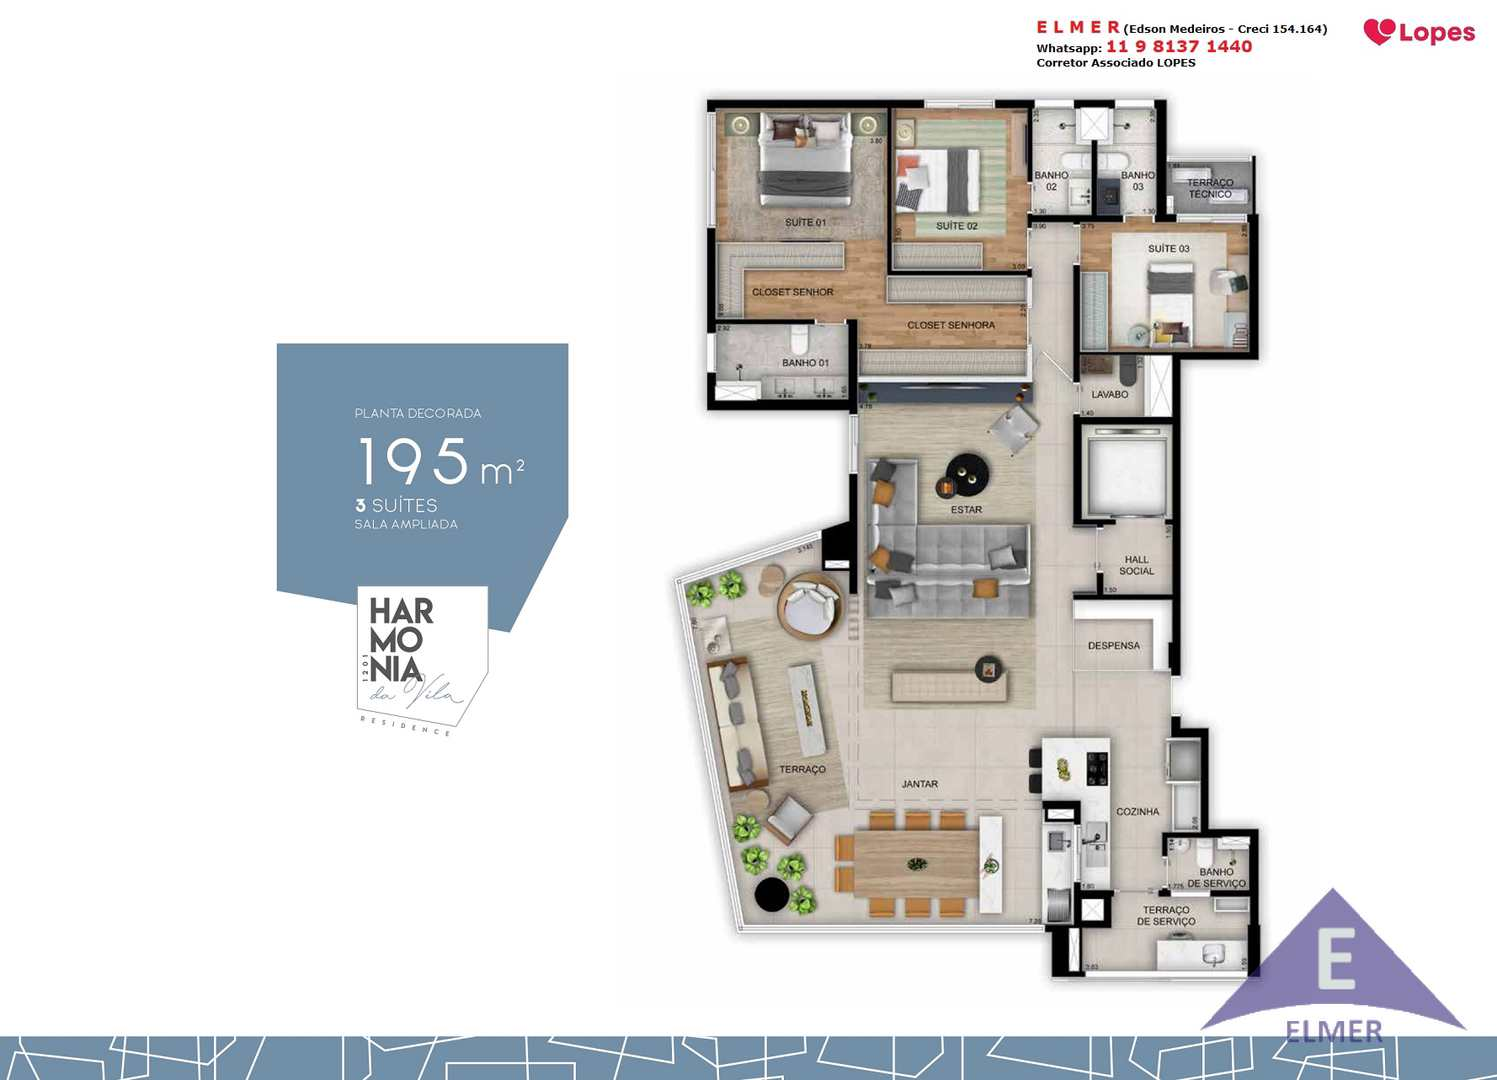 HARMONIA DA VILA - Apto 195 m² - 4 dorm (3suítes)- SP, Cod: 352